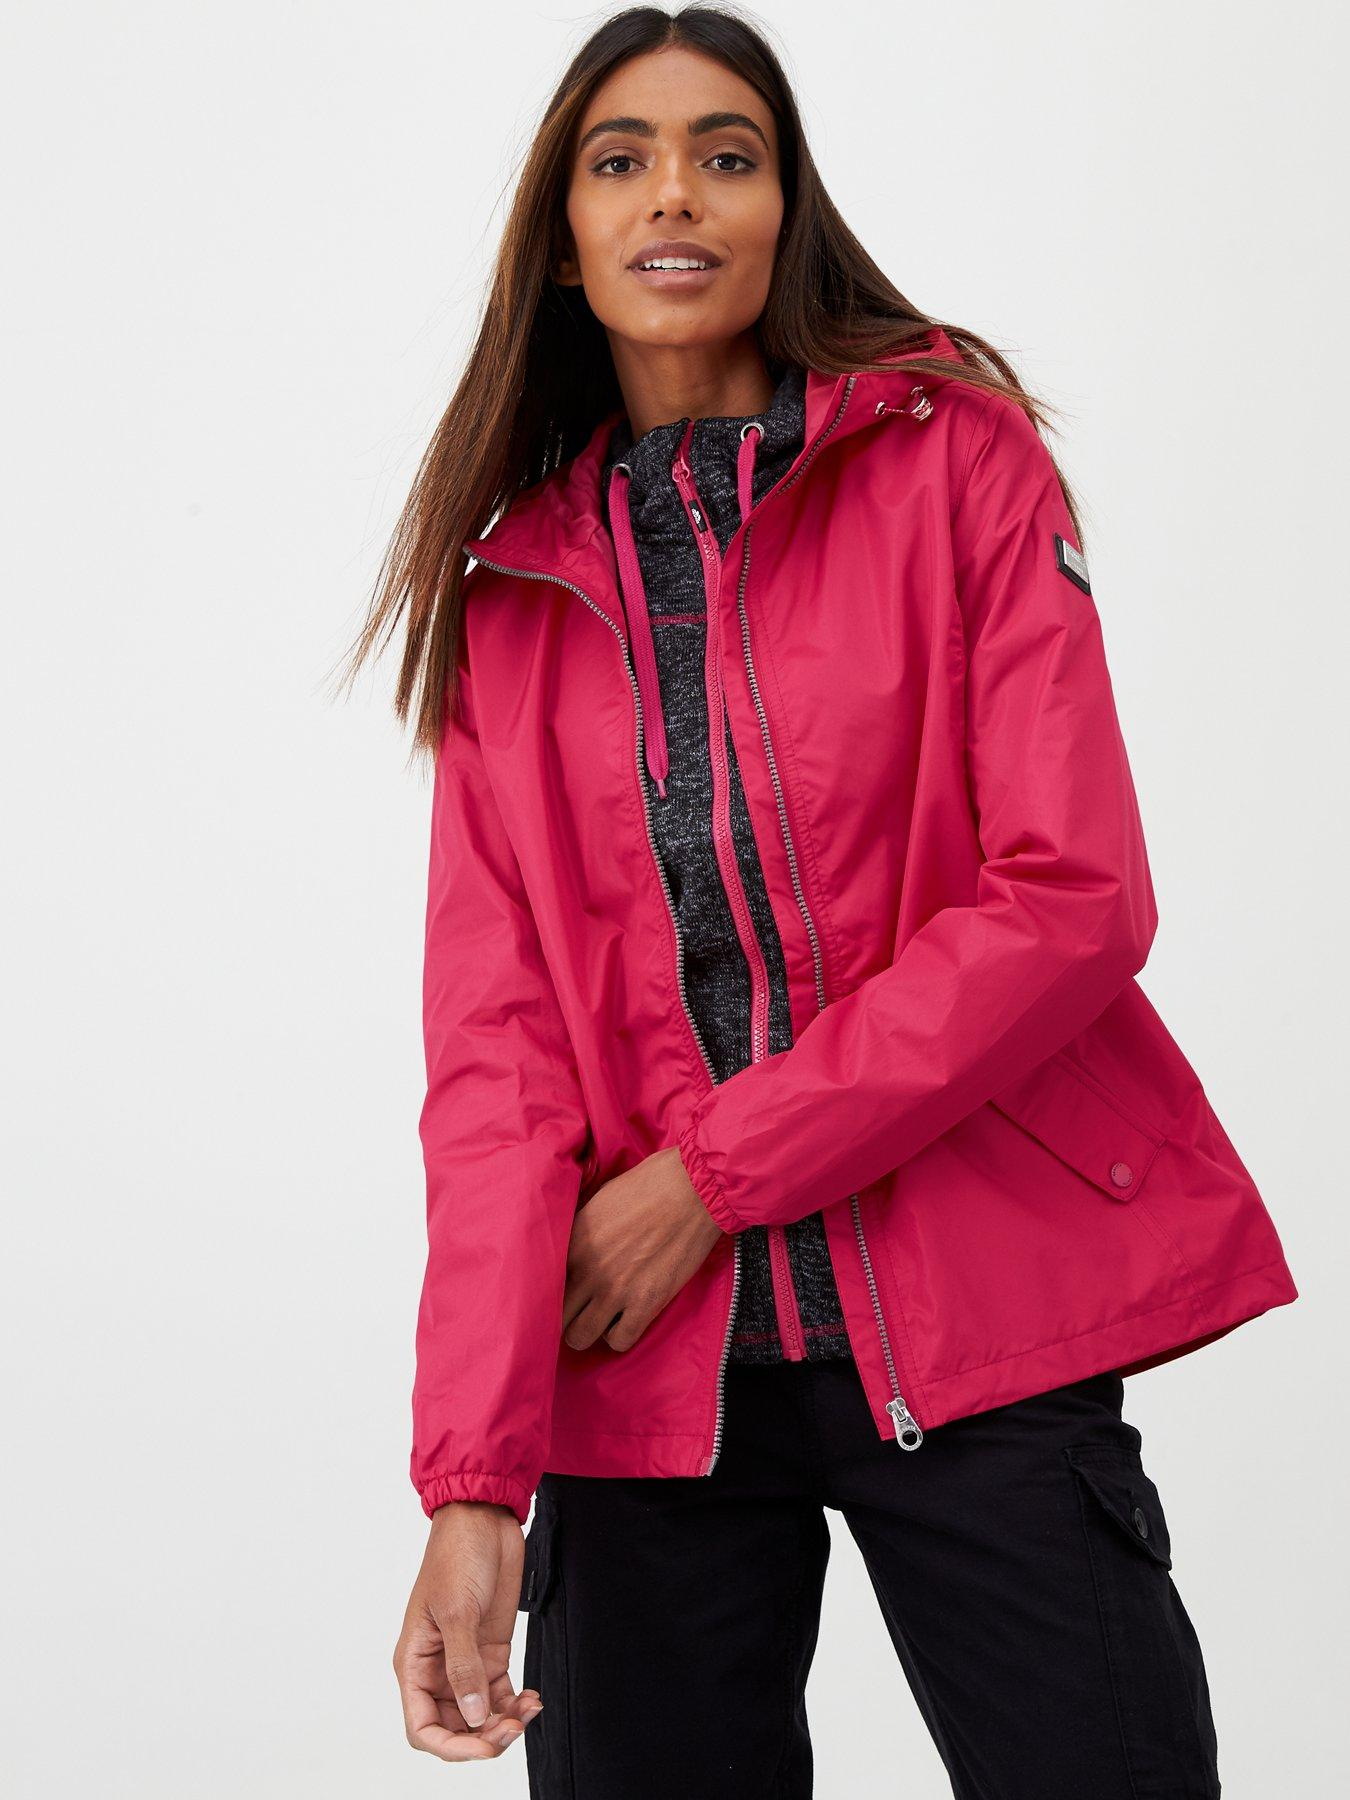 Pink Coats and Jackets | POPSUGAR Fashion UK